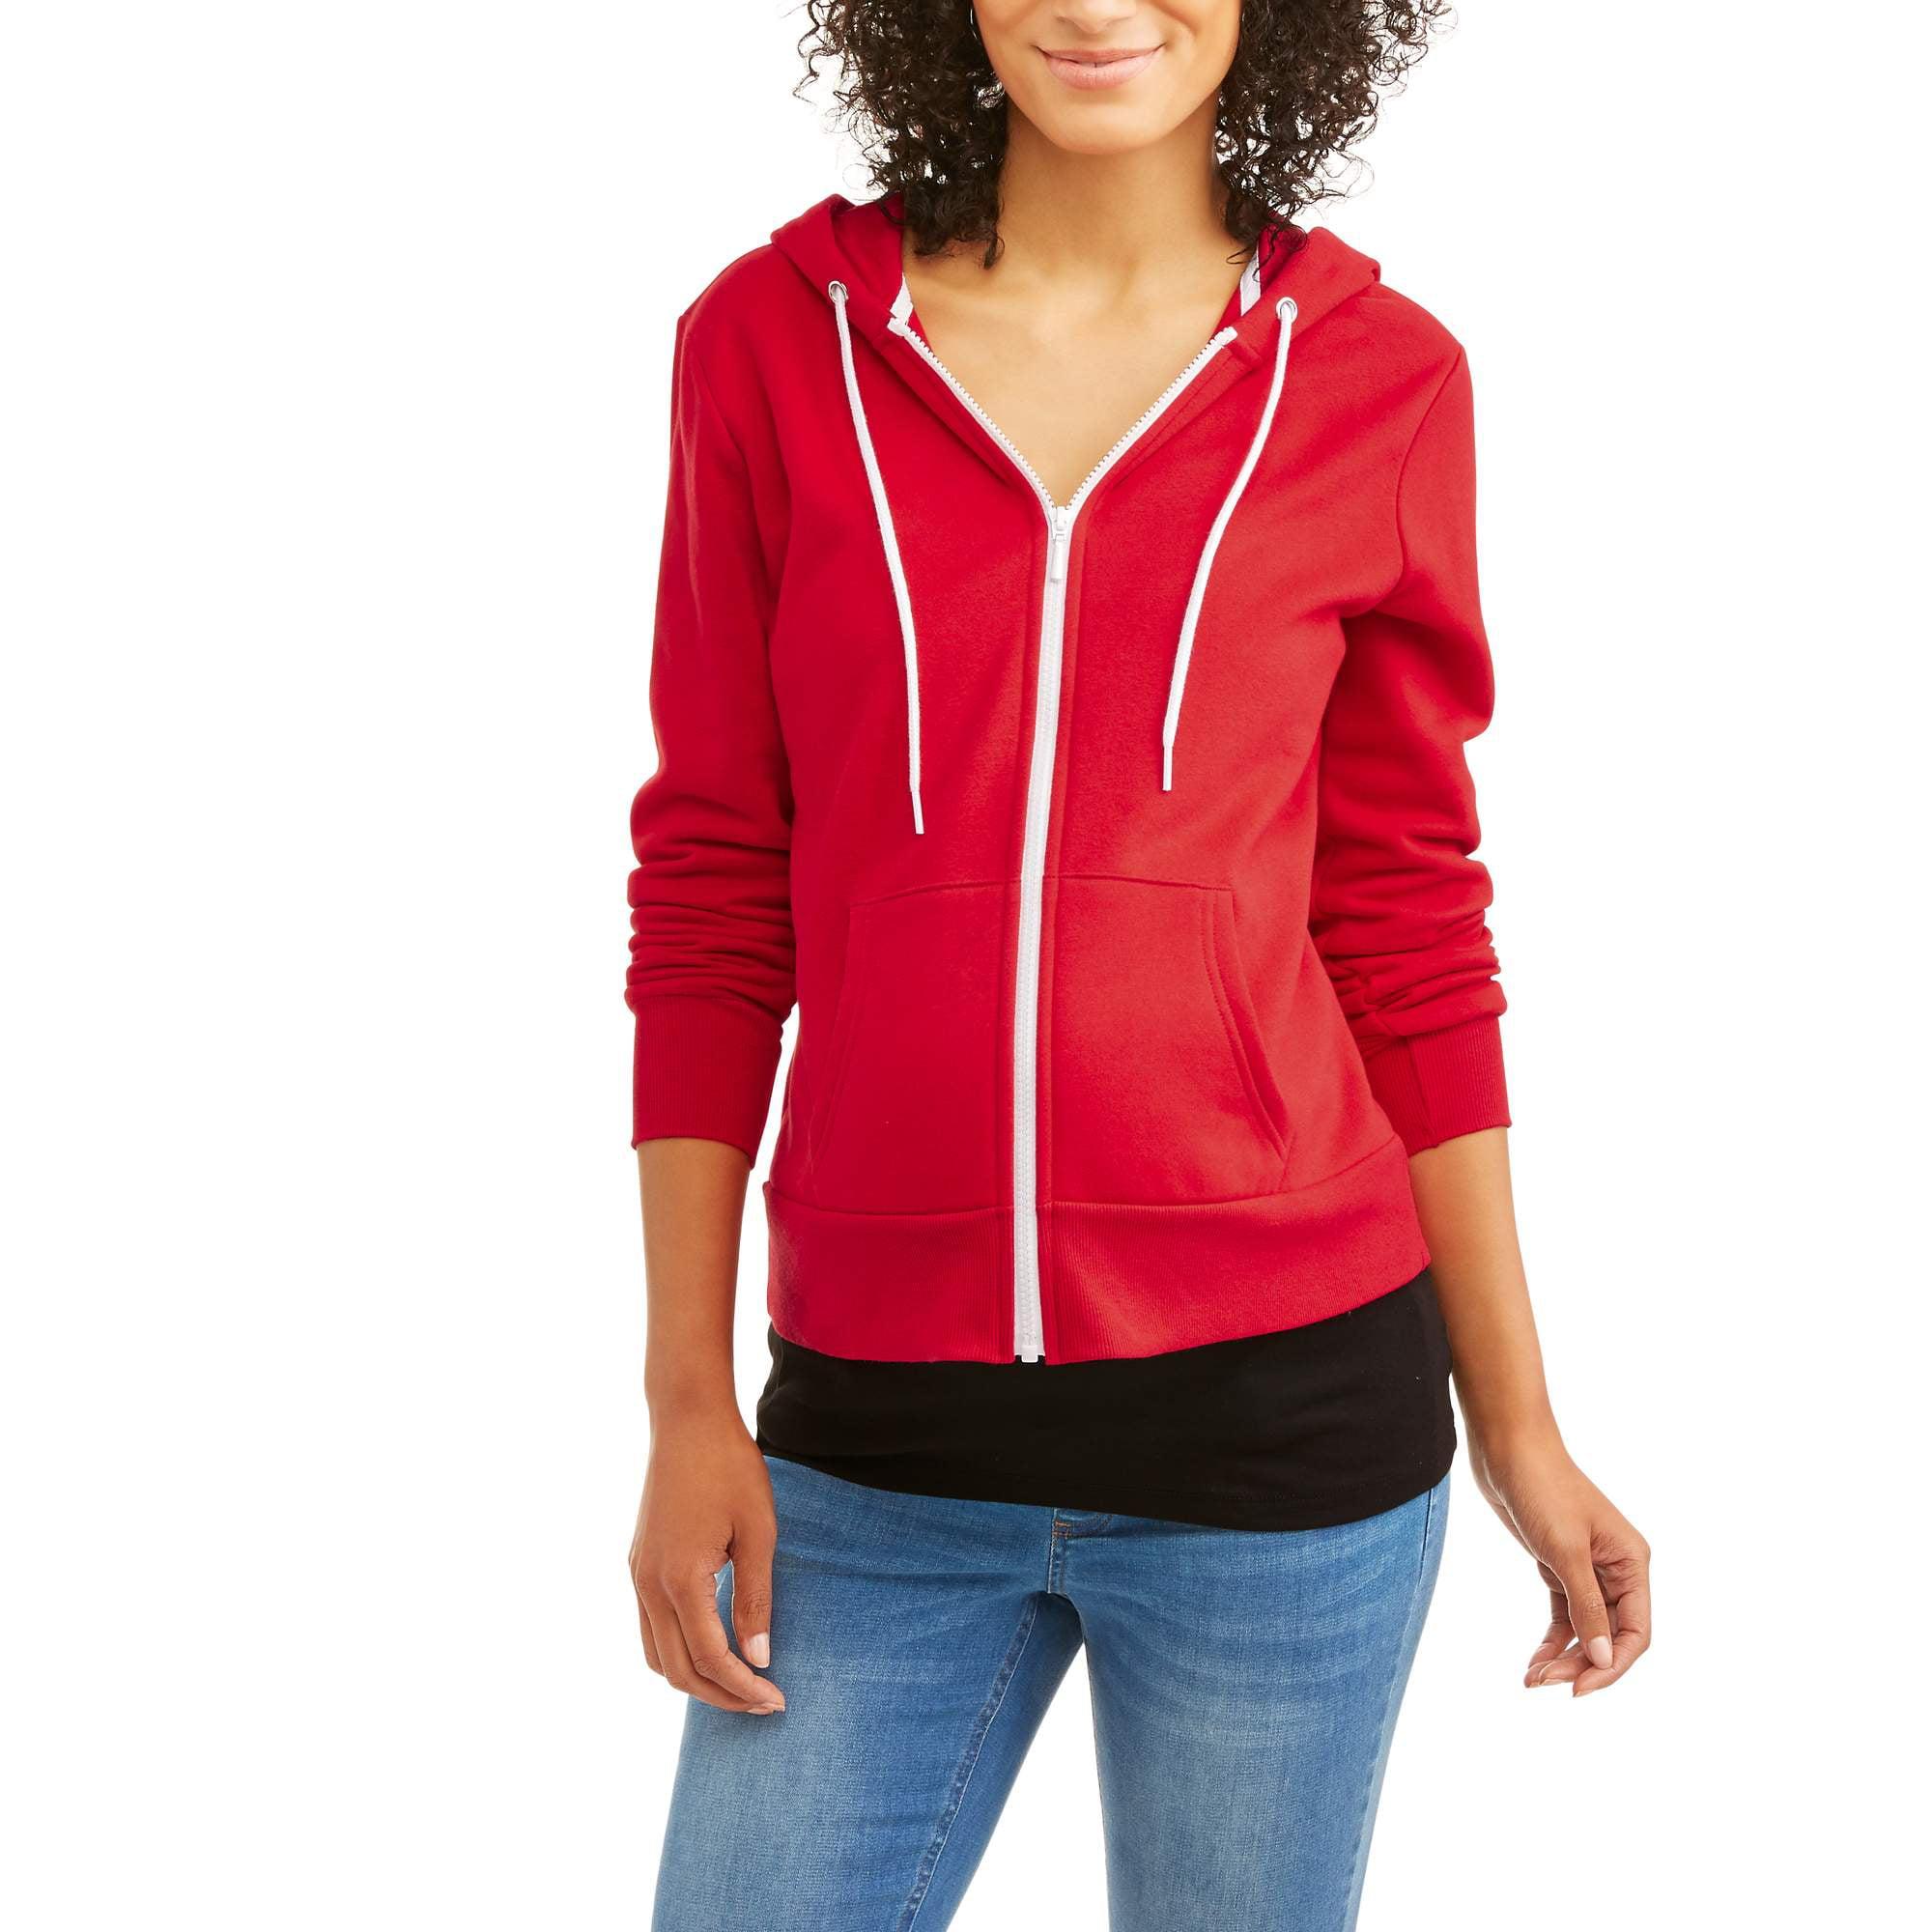 Maternity Zip Up Hooded Sweatshirt by